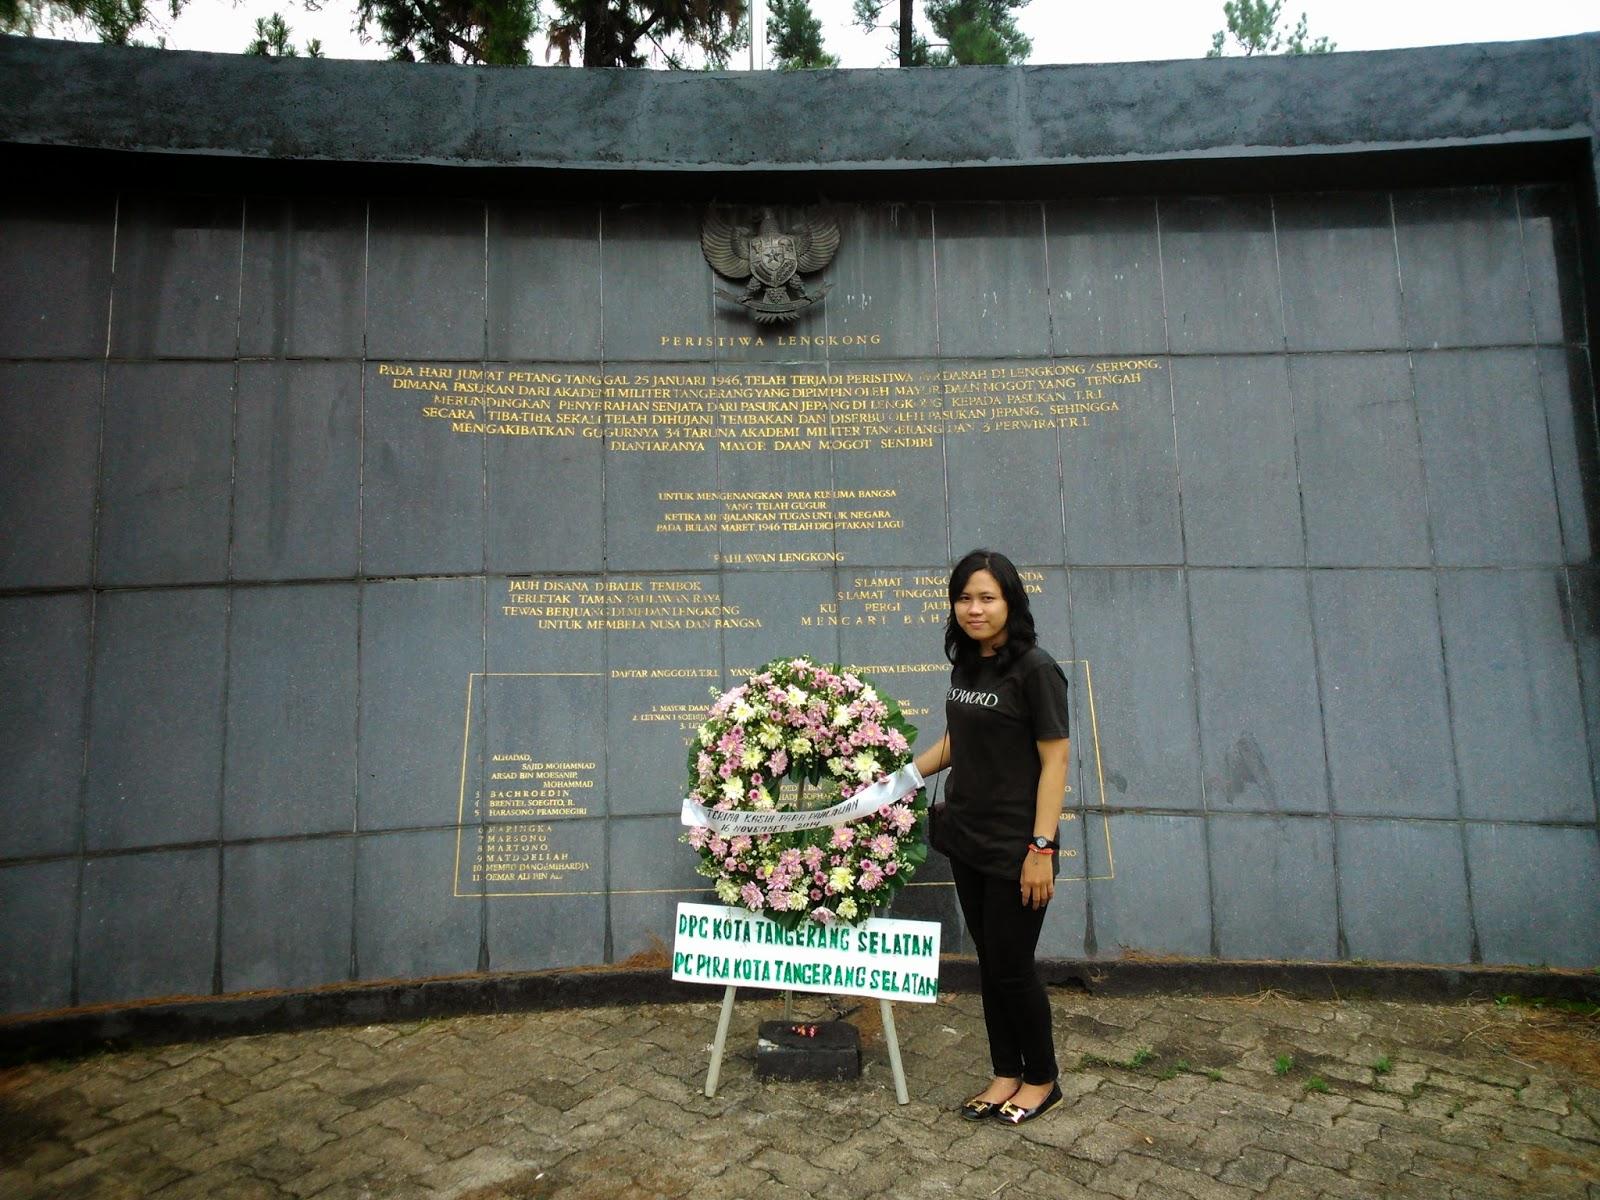 Kota Tangerang Selatan Goresan Penaku 1 Monumen Lengkong Musium